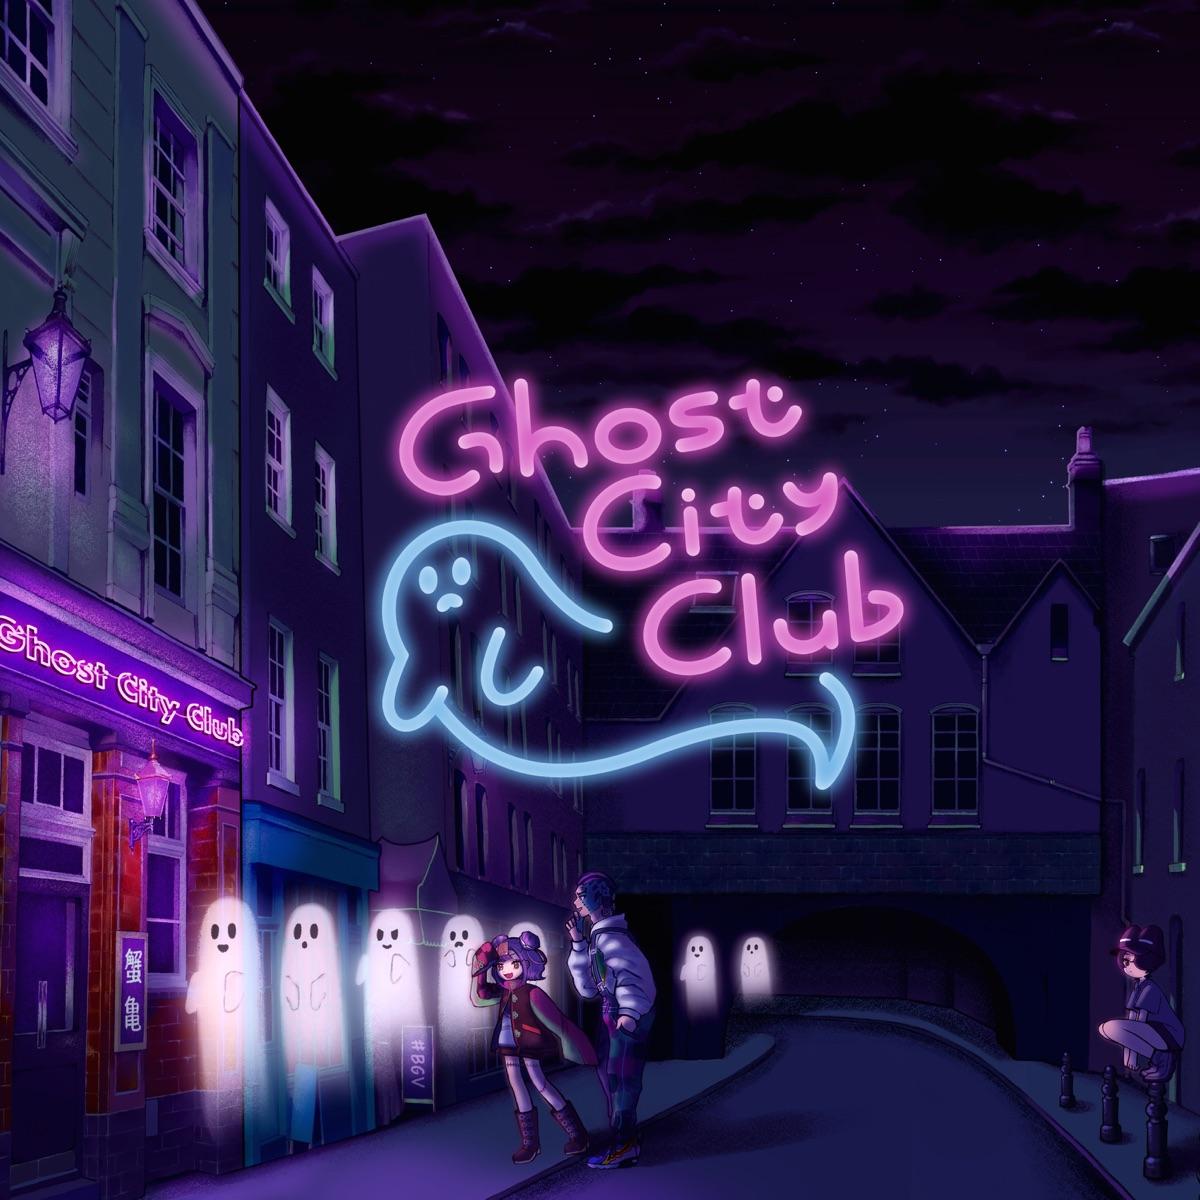 『BOOGEY VOXX - Ghost City Club feat. 隣町本舗』収録の『Ghost City Club』ジャケット